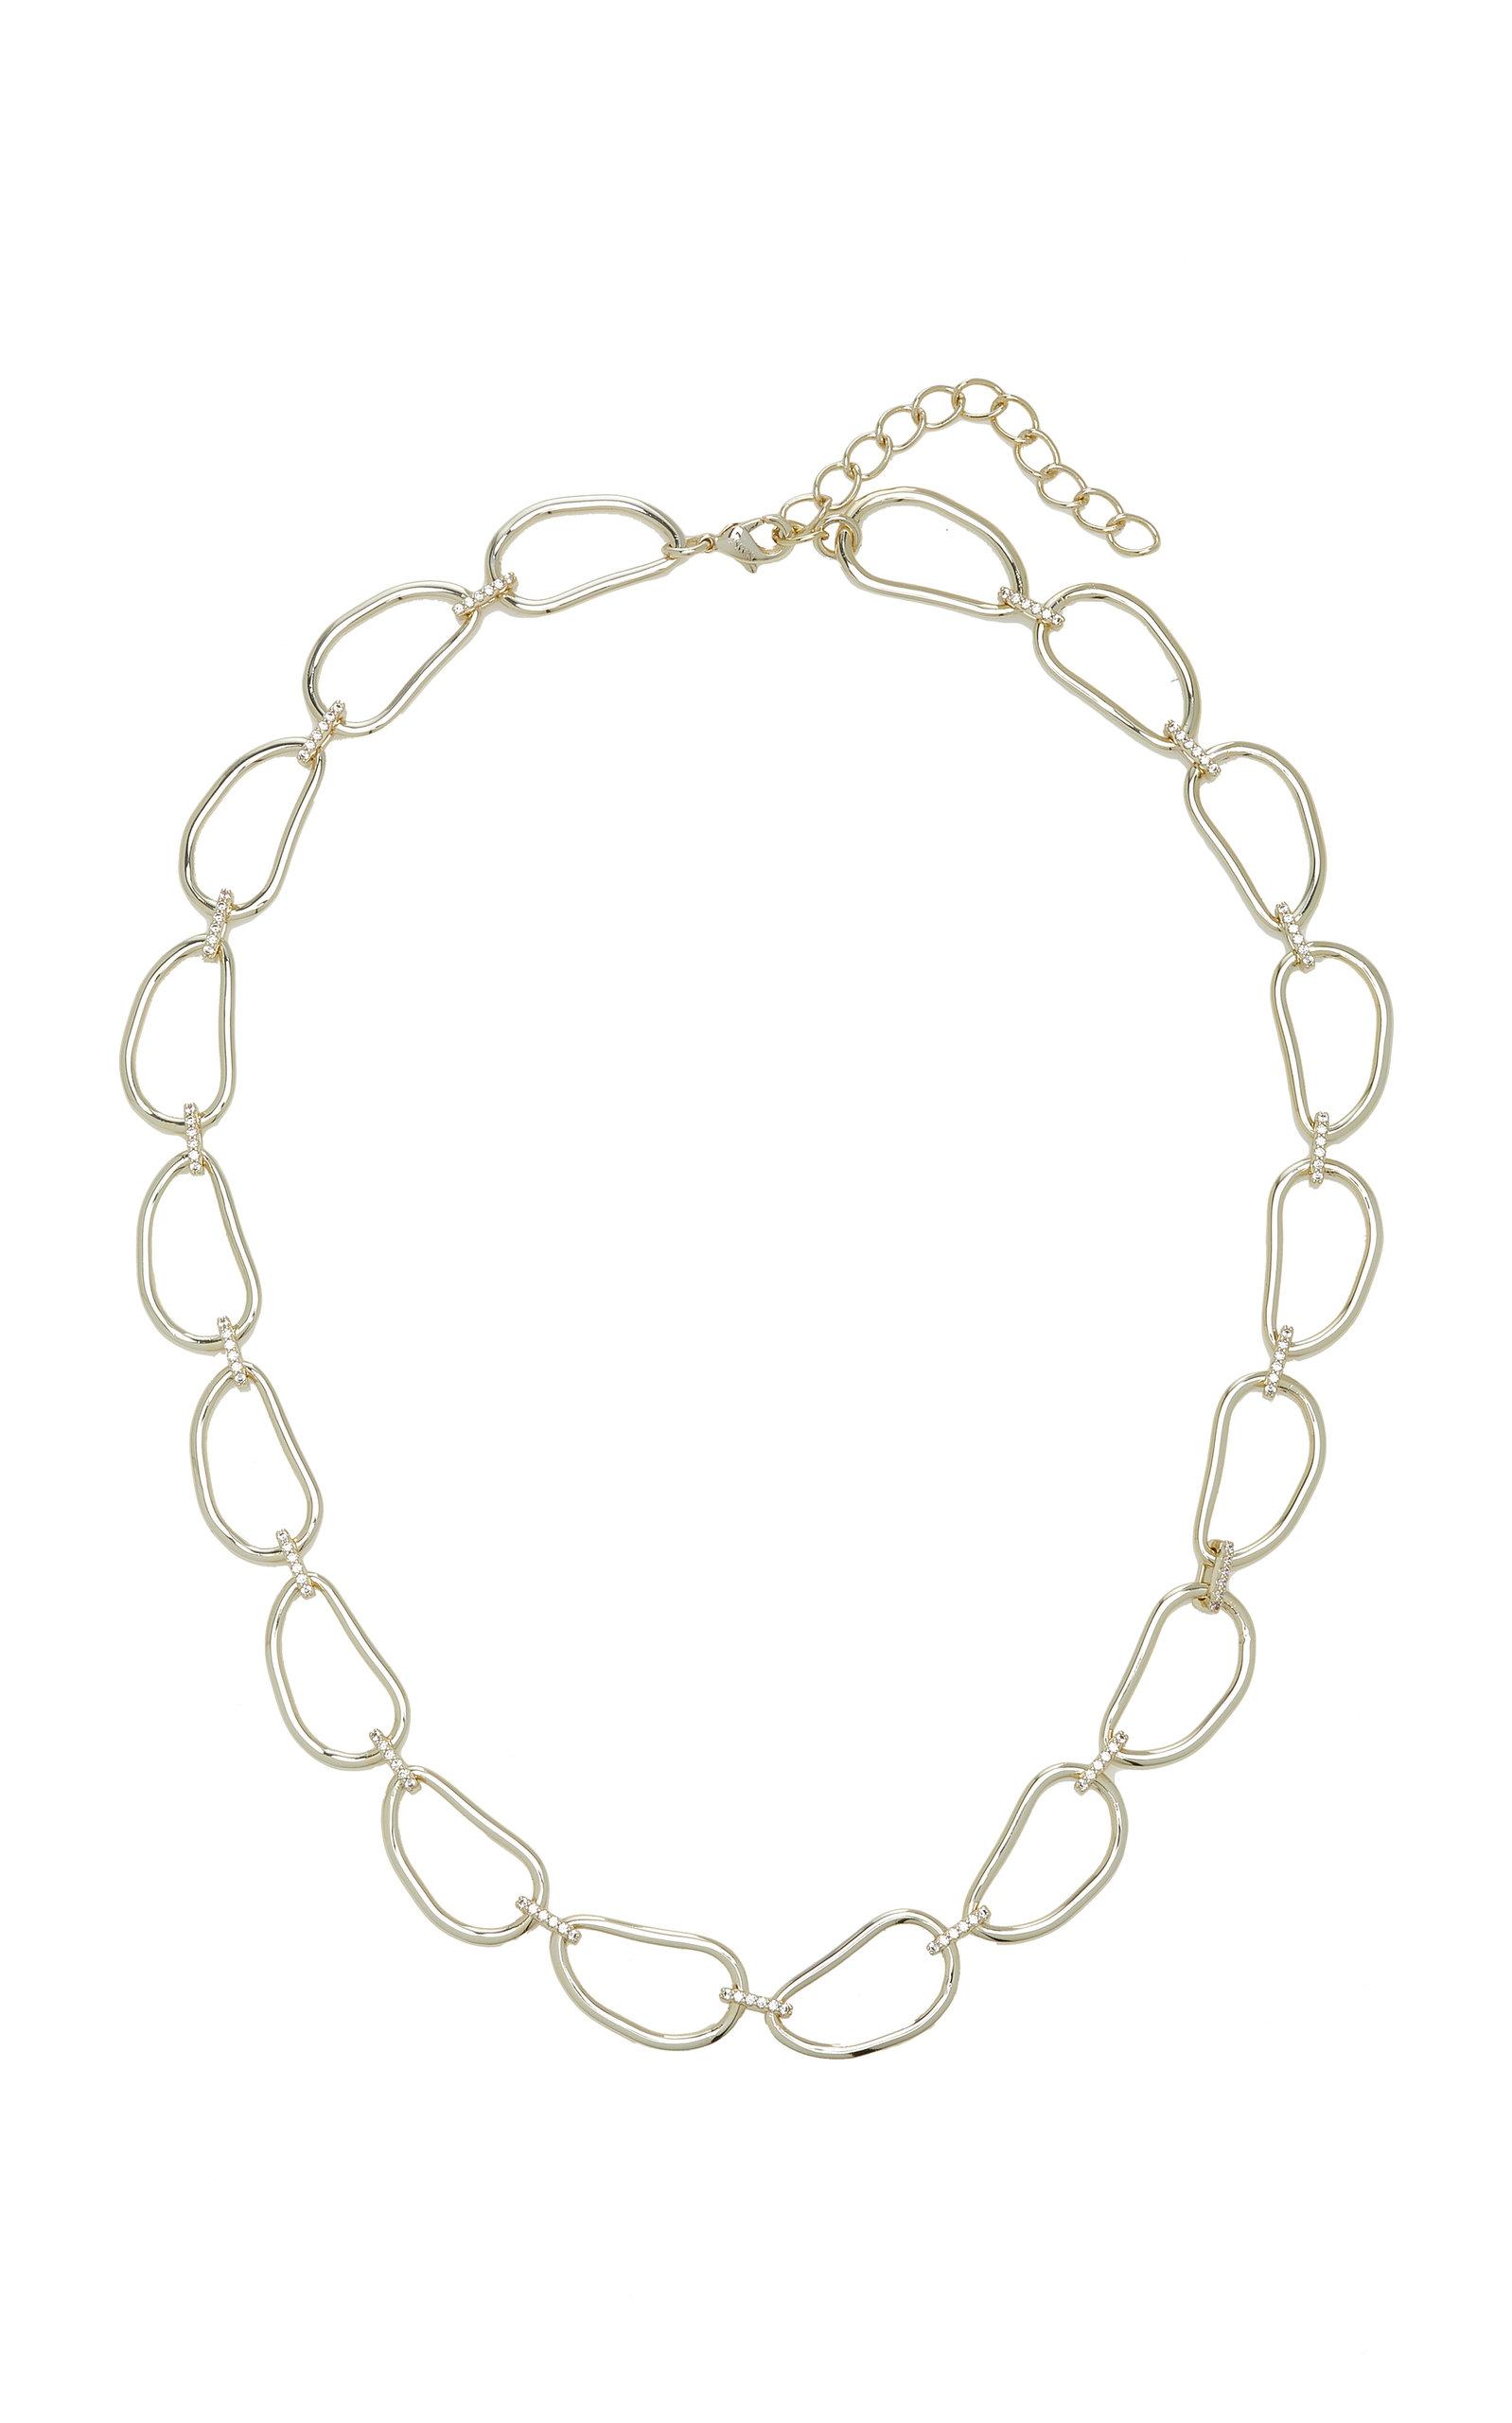 Emili - Women's Karen Gold Vermeil-Plated Necklace - Gold - Moda Operandi